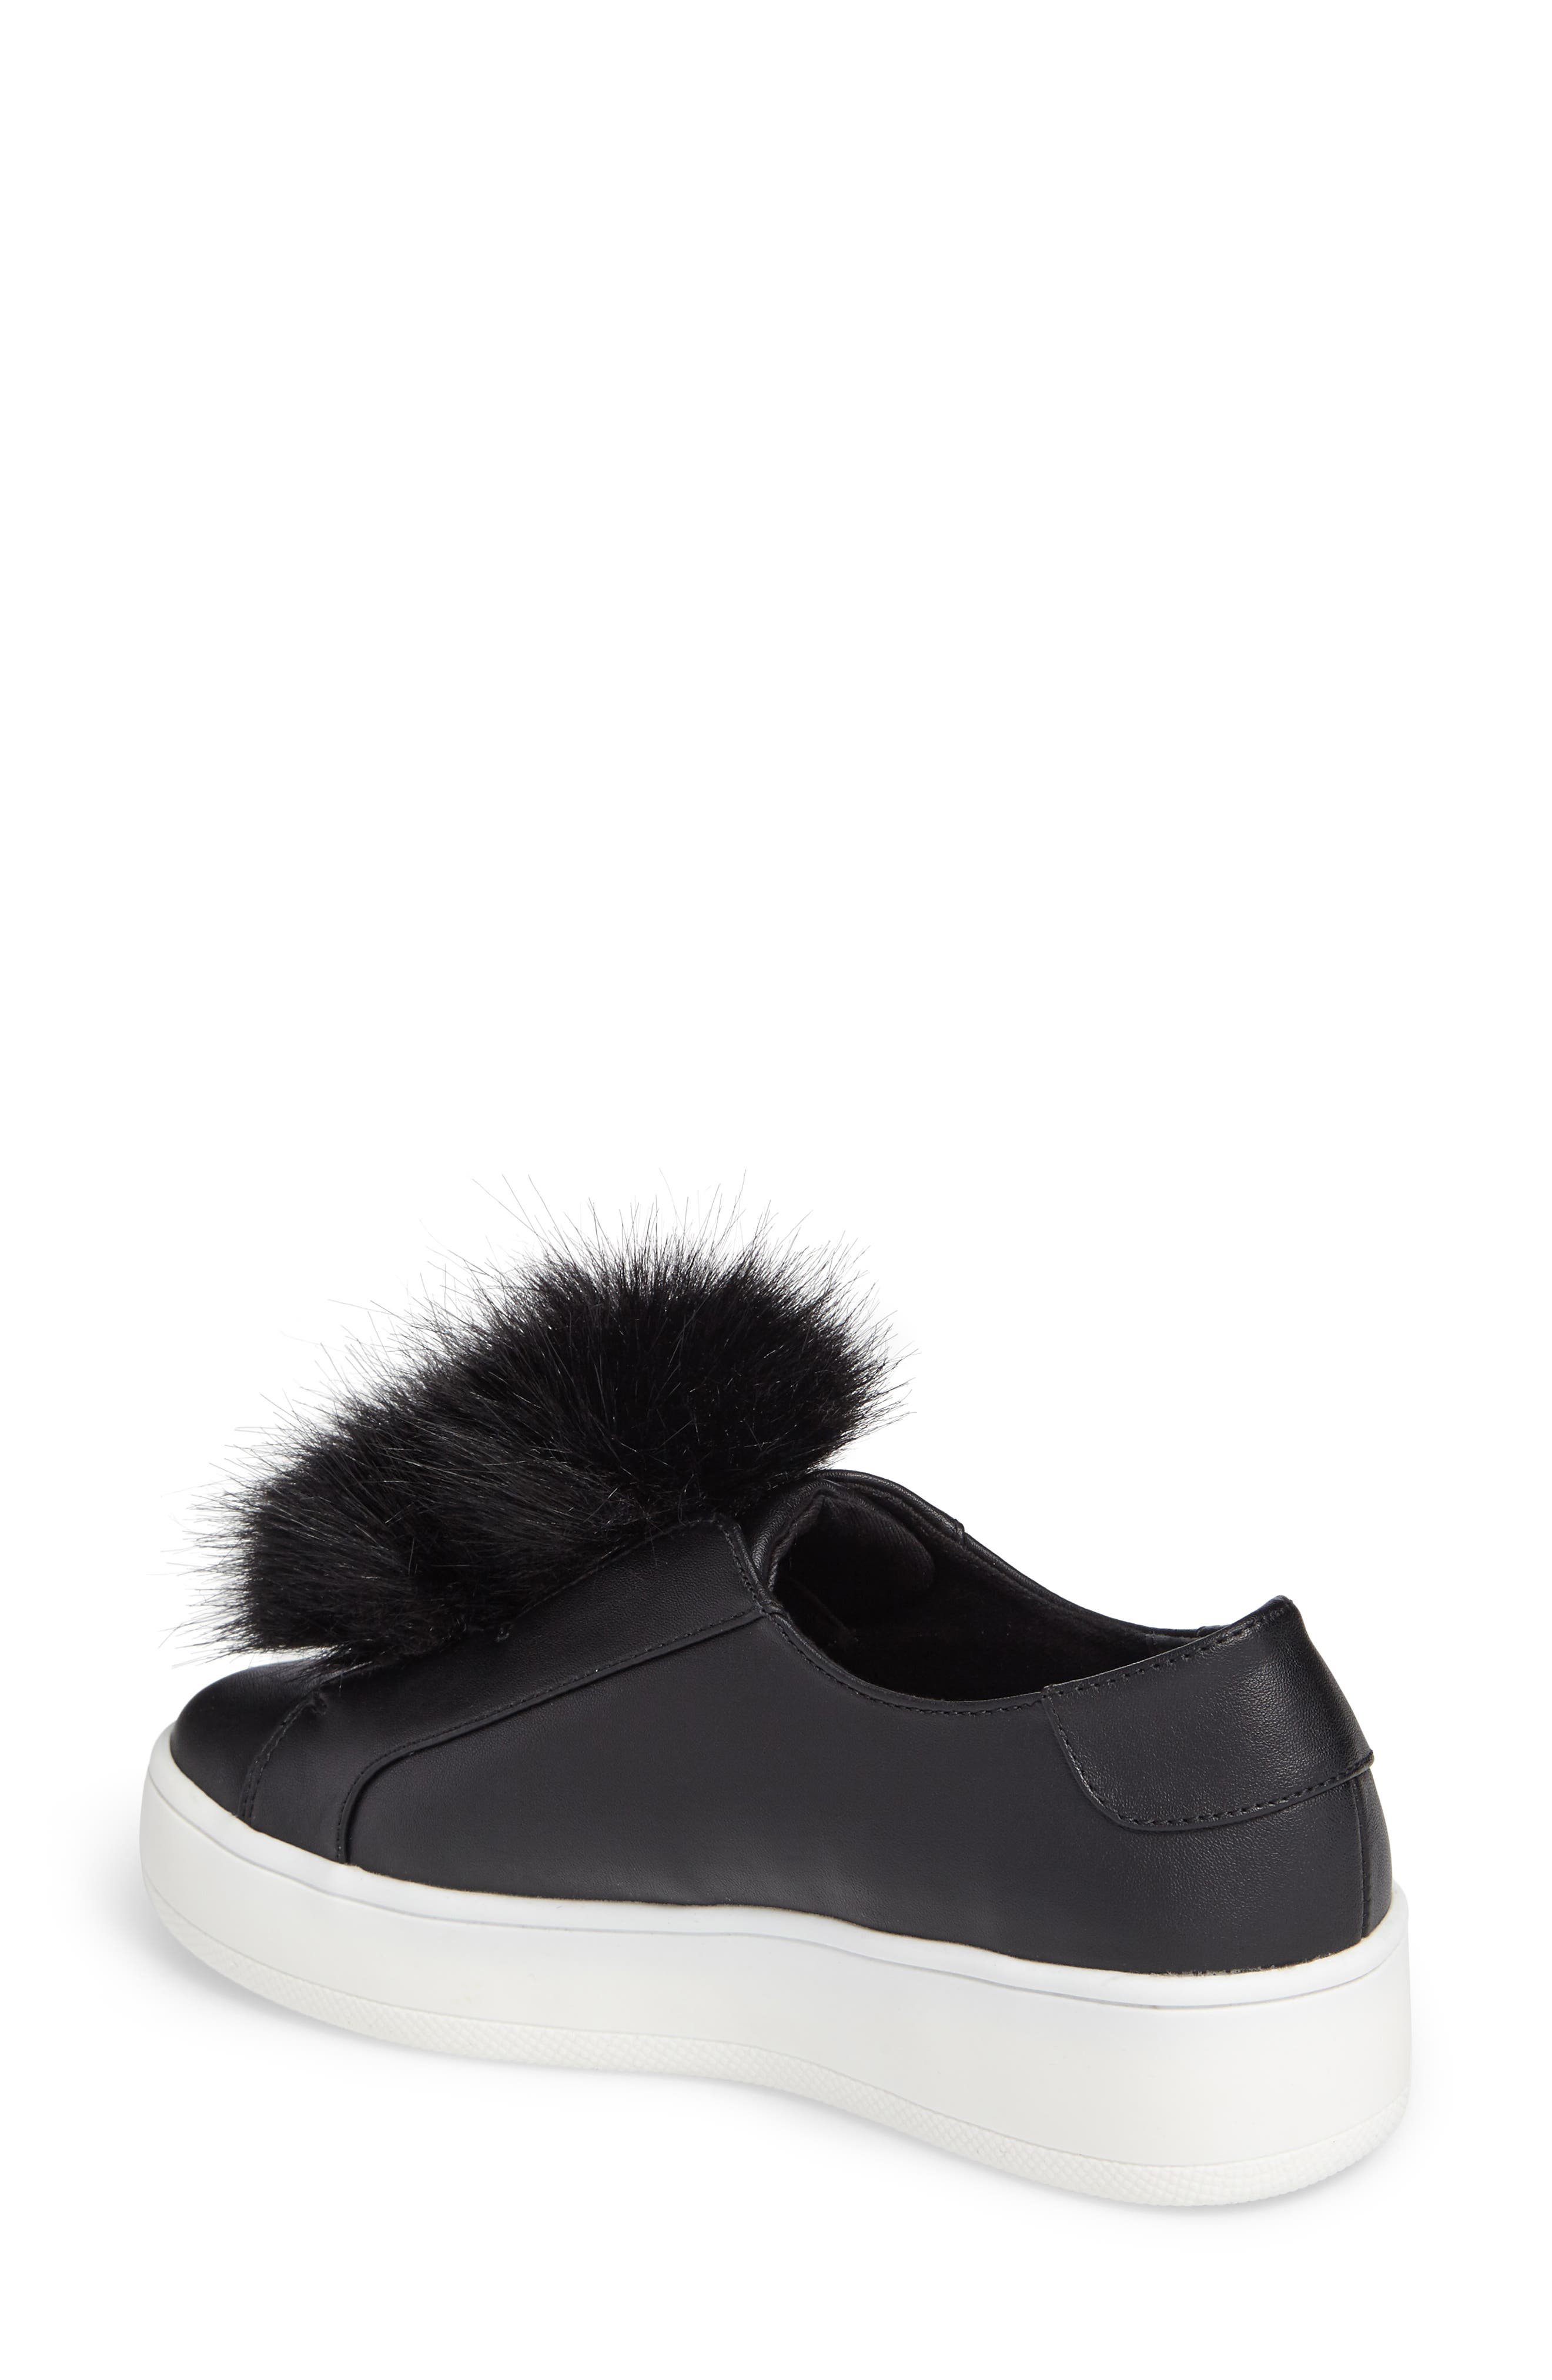 Breeze Faux Fur Pom Sneaker,                             Alternate thumbnail 2, color,                             001